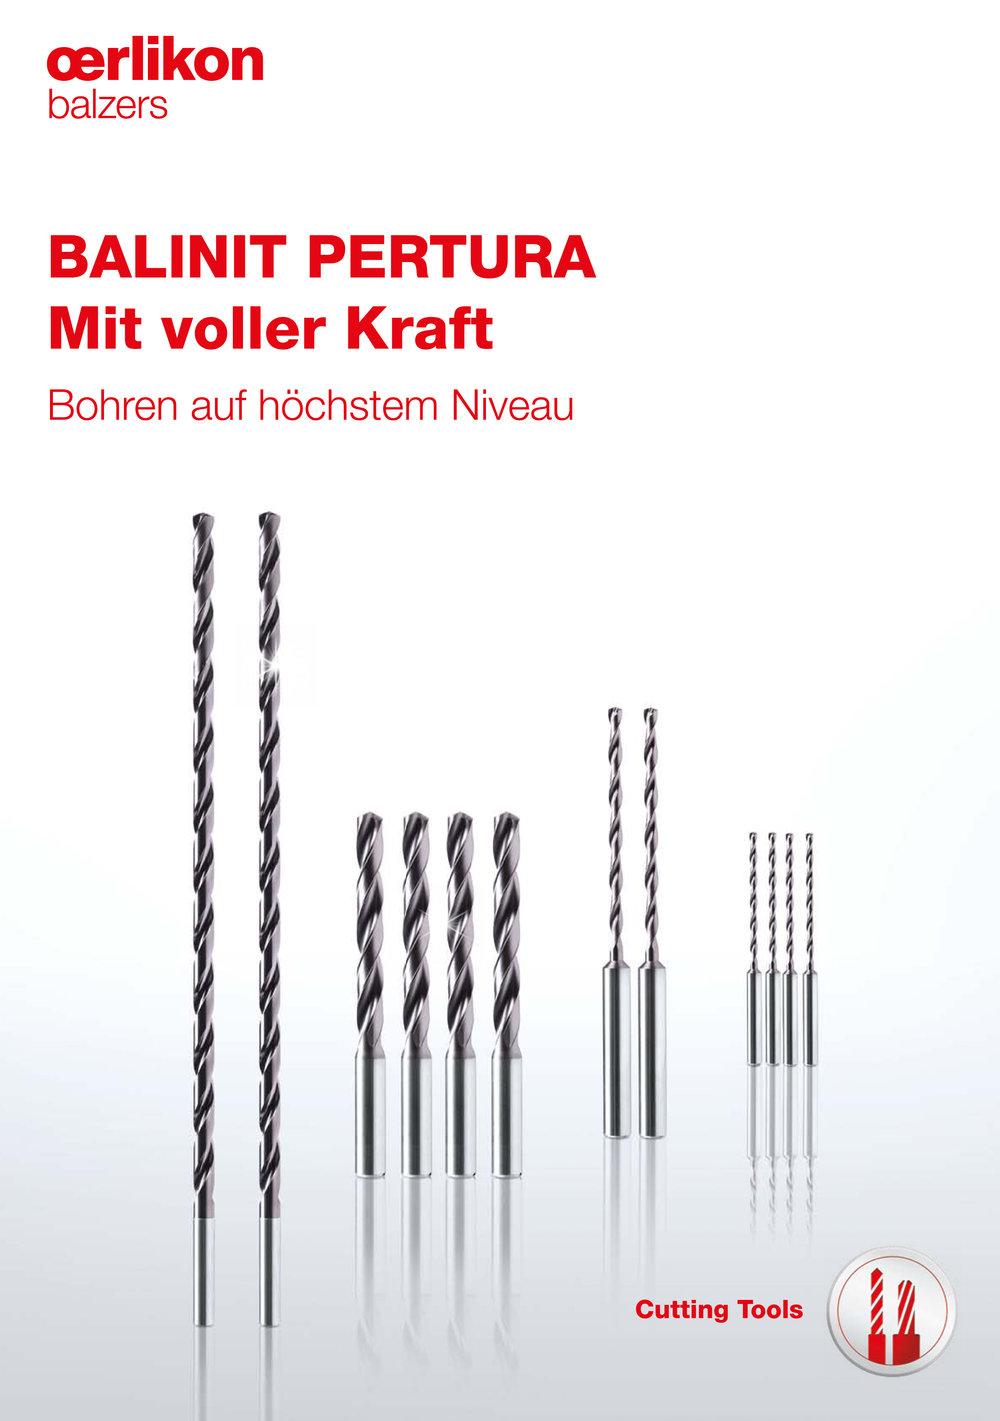 Produktbroschüre BALINIT PERTURA - Oerlikon Balzers